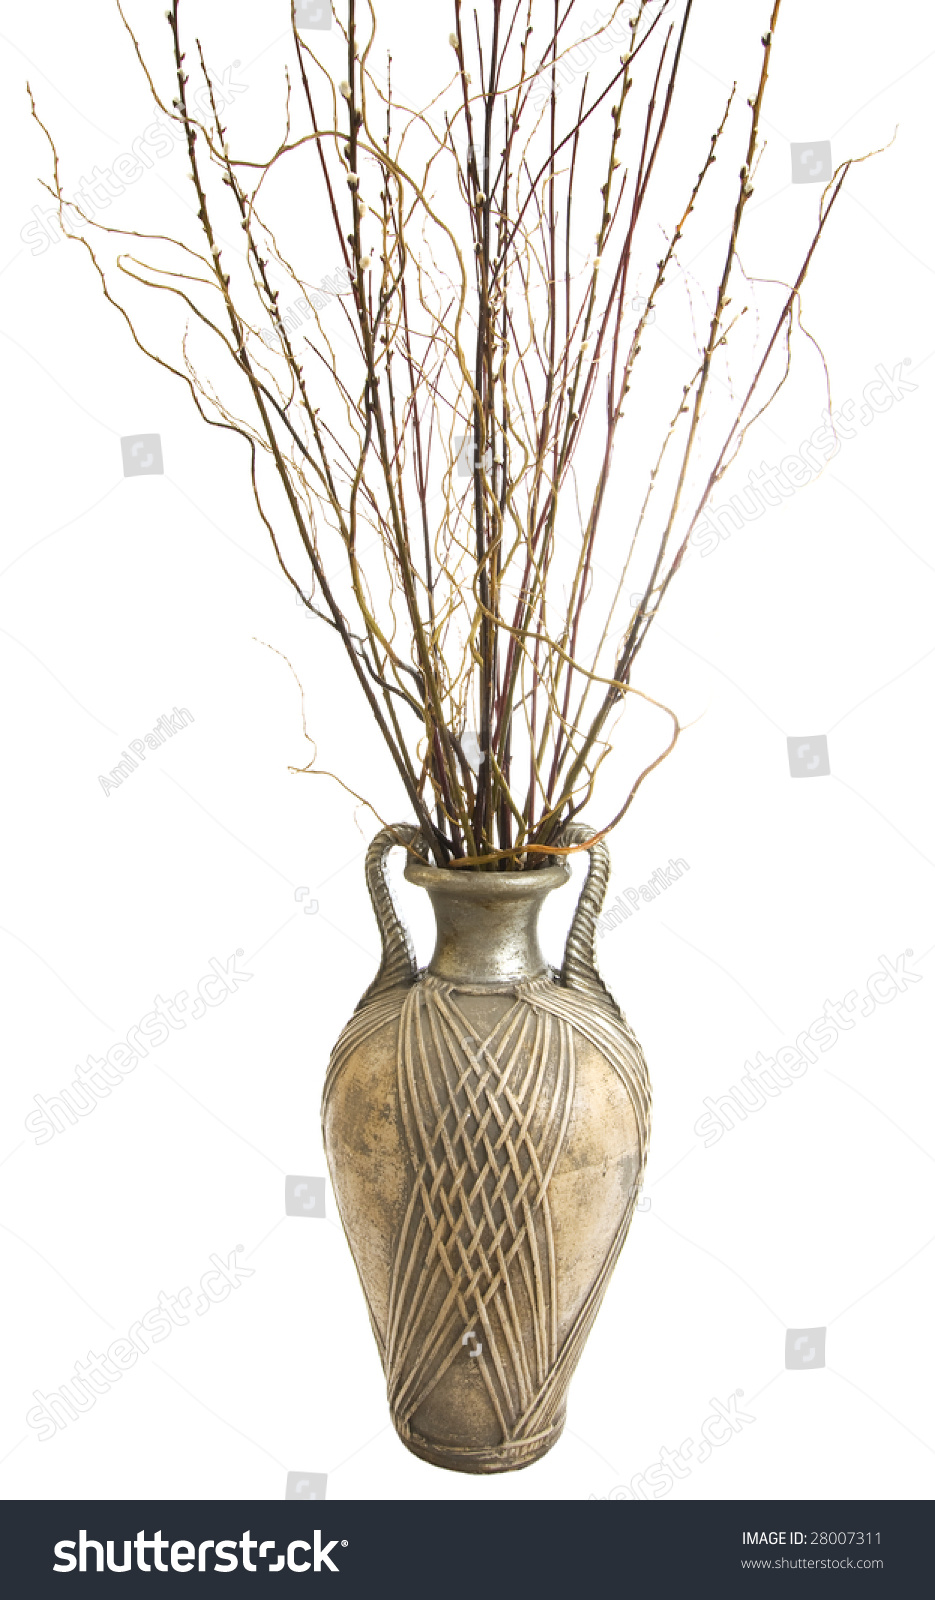 Large Antique Floor Vase With Decorative Sticks Arrangement Isolated On White